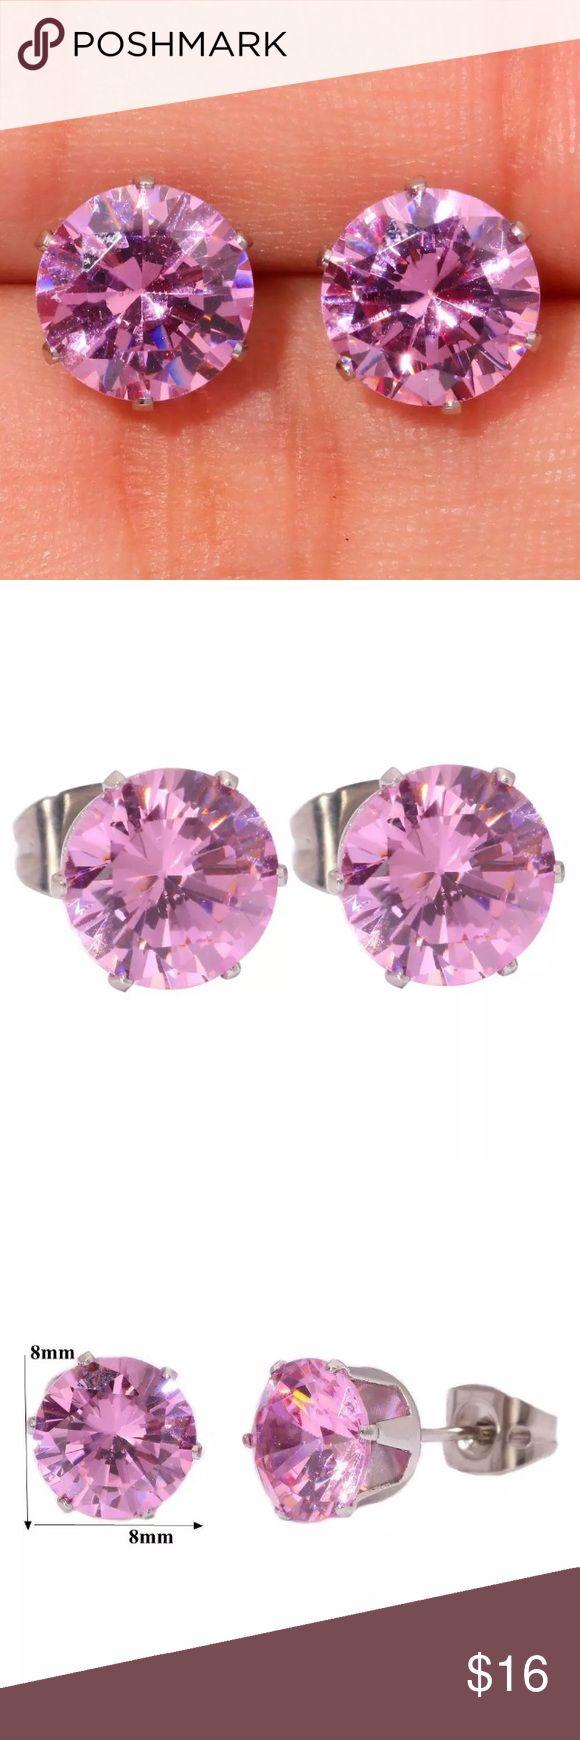 8mm Pink Topaz Gemstone & Stainless Steel Earrings Boutique